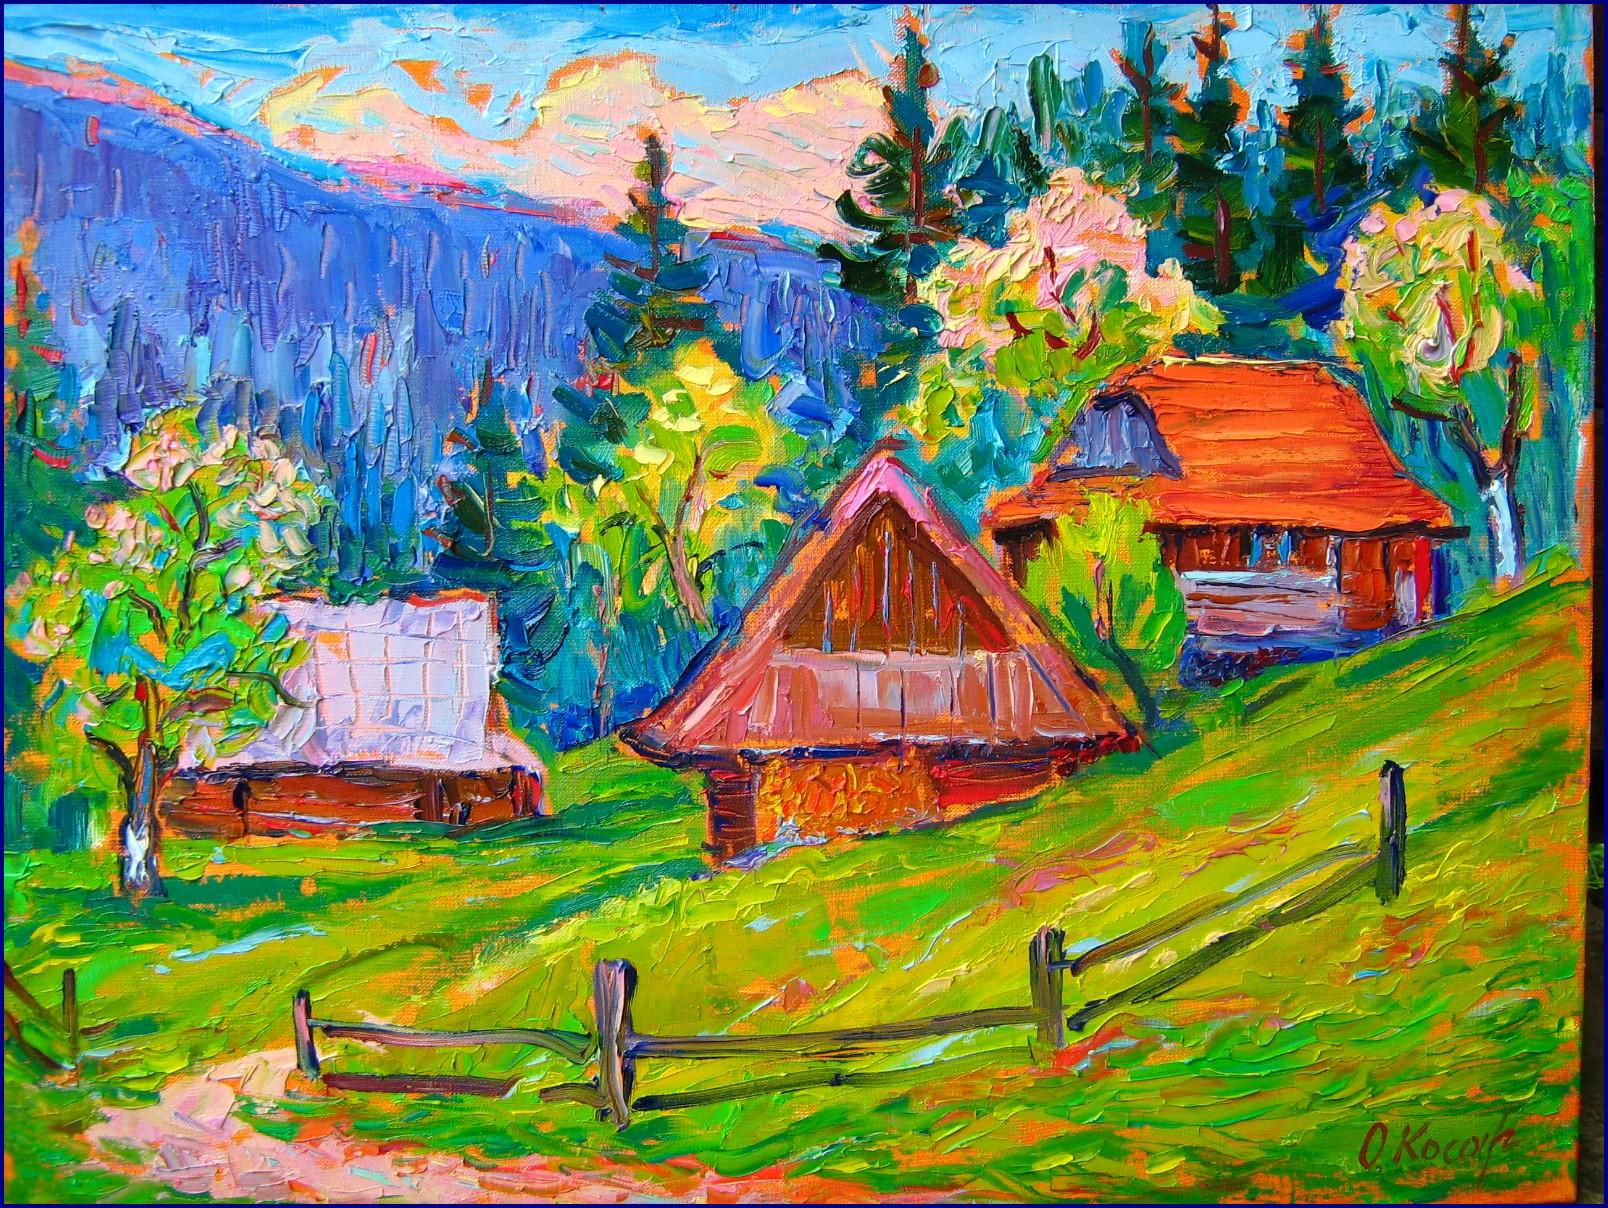 1310917308_hatki-1600x1200_www.nevsepic.com.ua